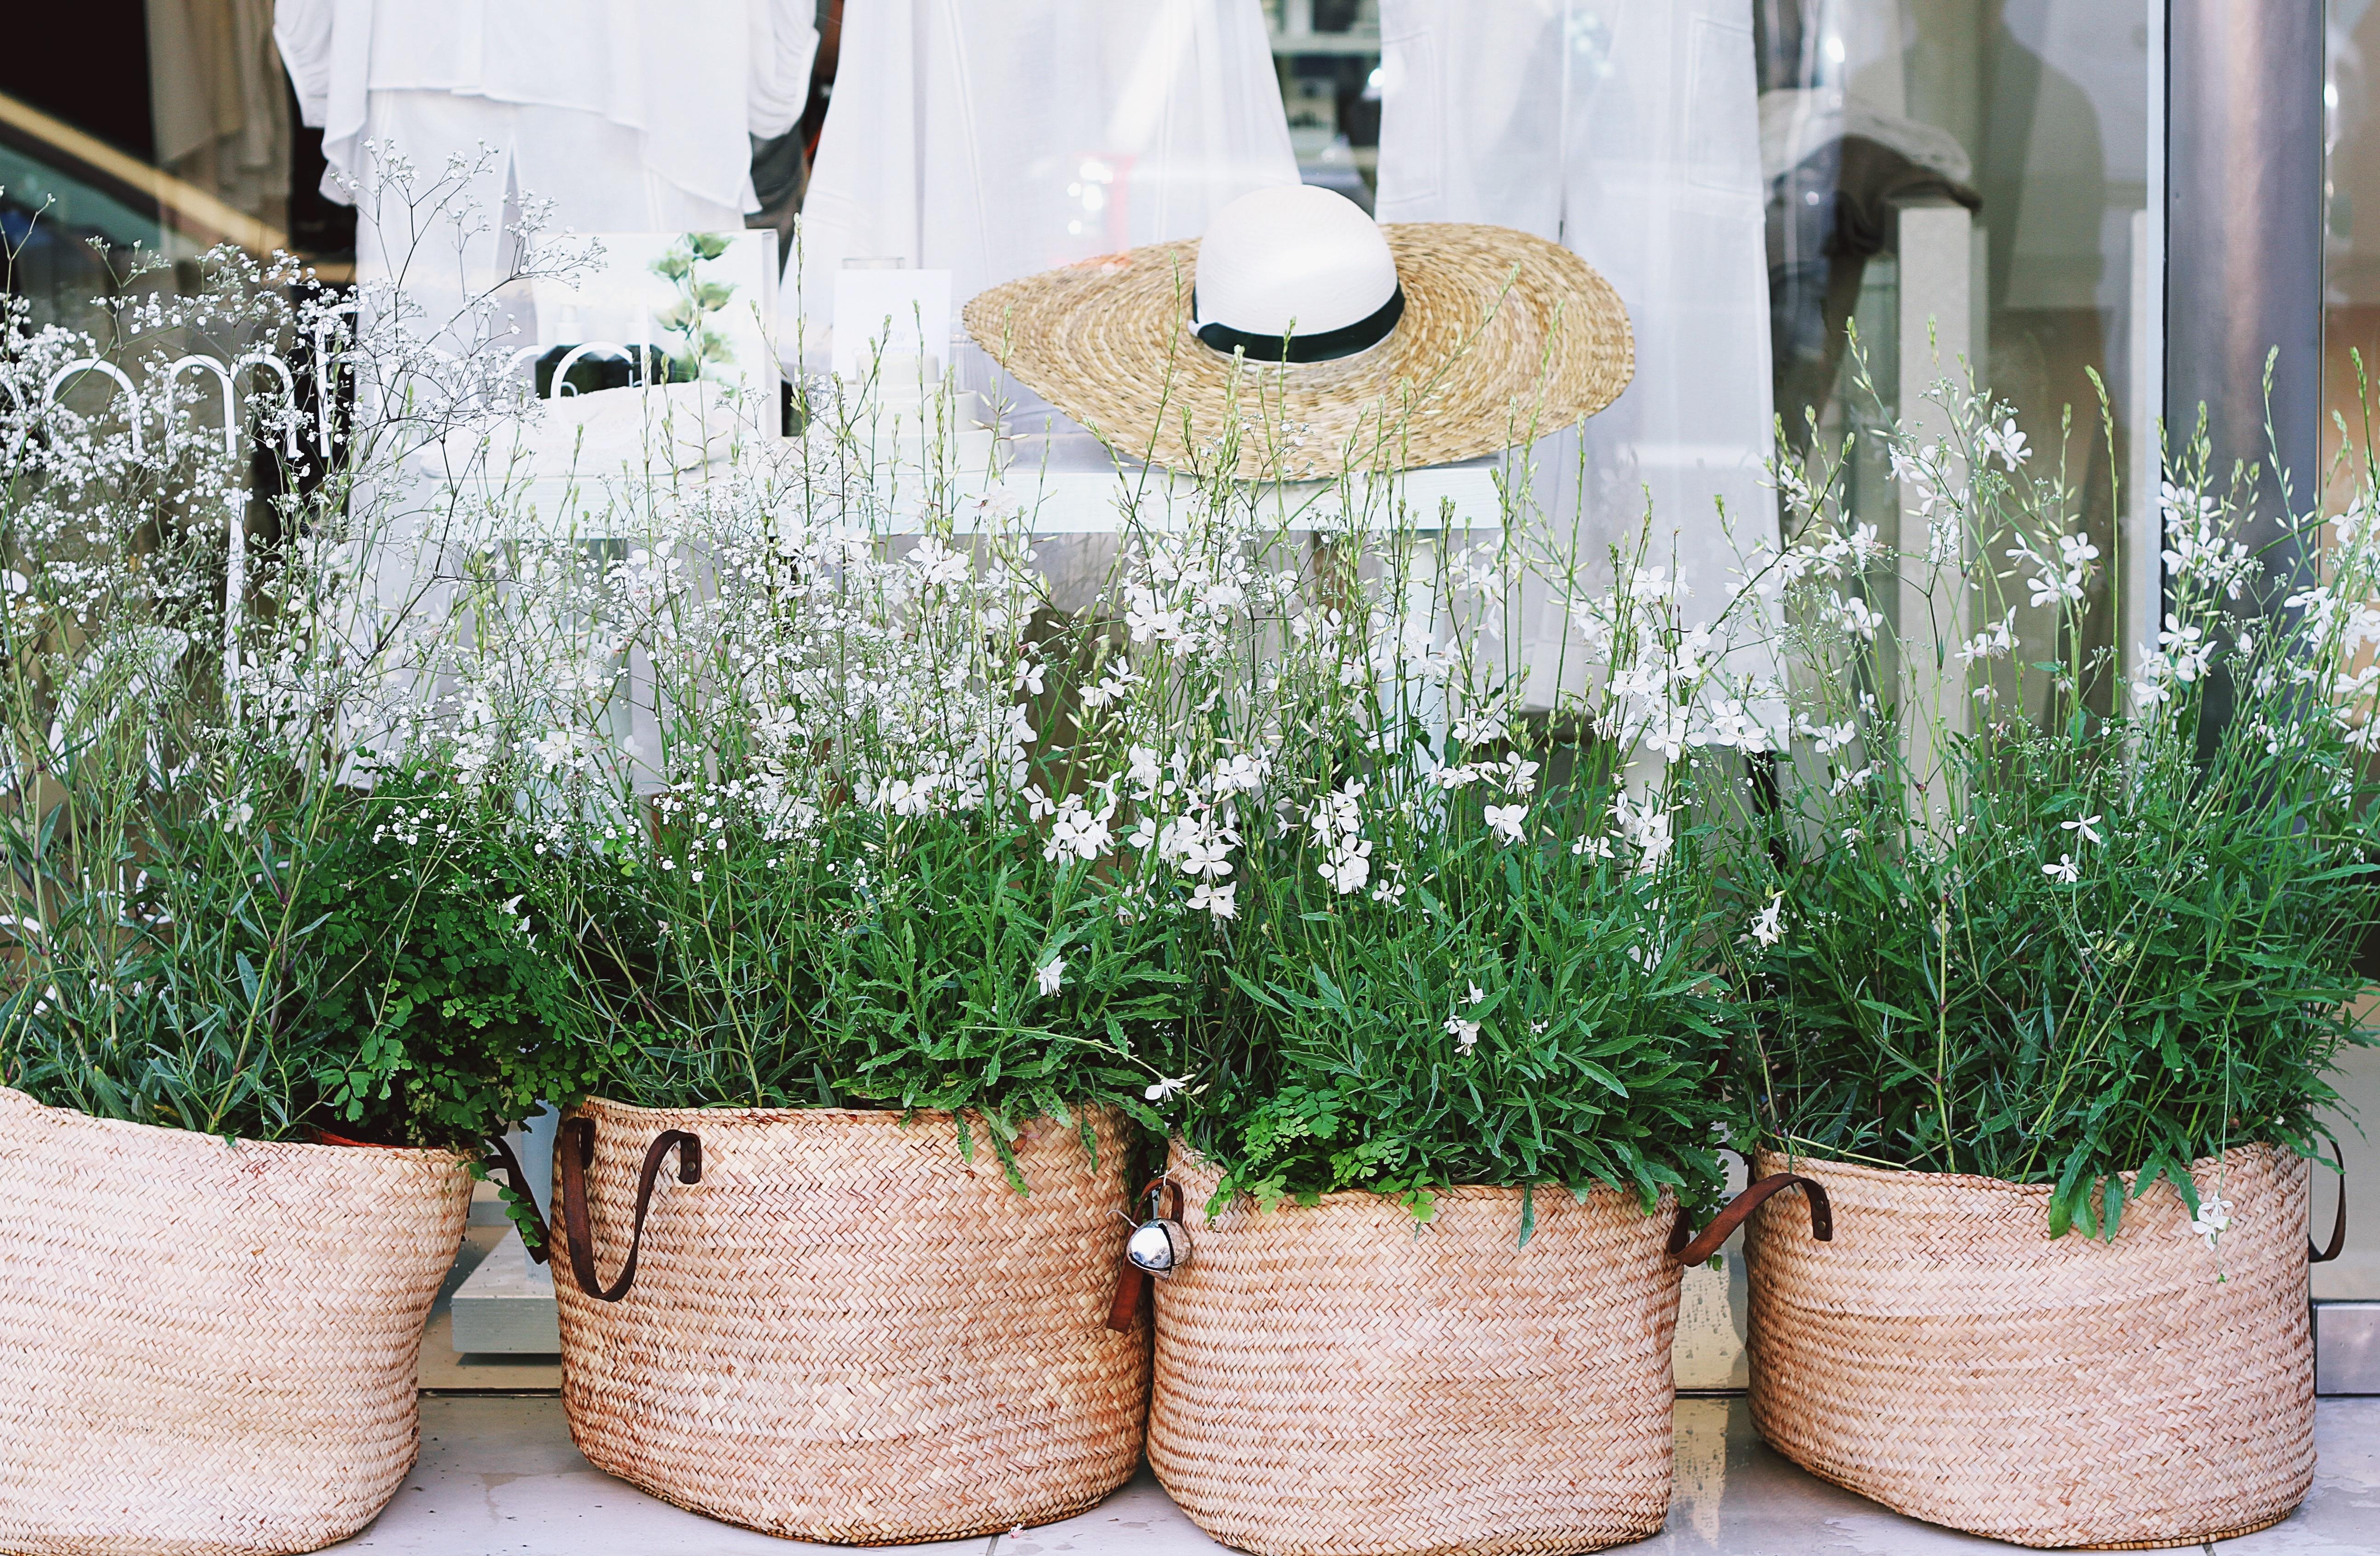 Free Images Plant White Shop Herb Bag Basket Flowerpot